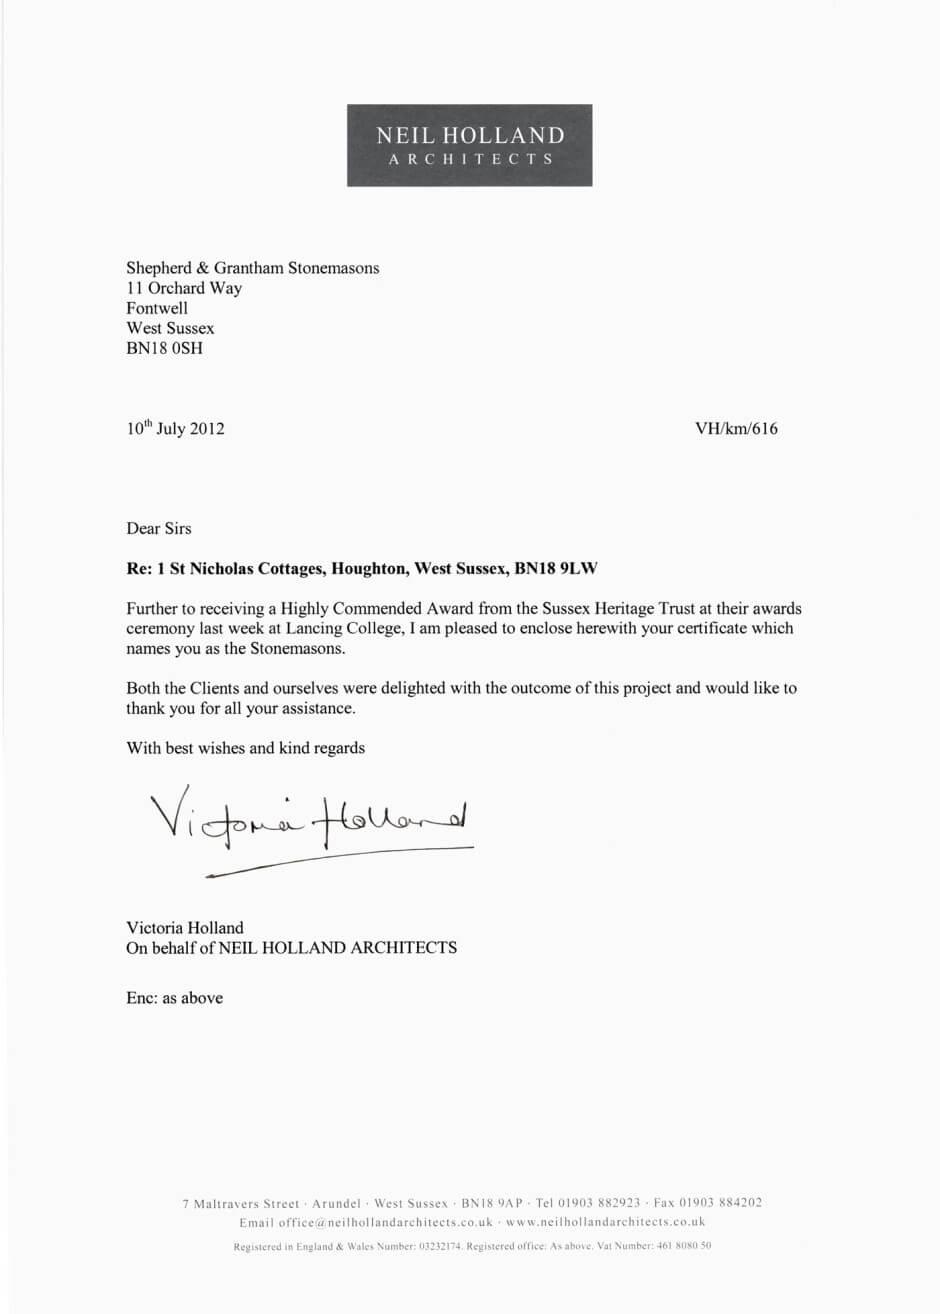 2012-07-10-Award-Confirmation-Letter